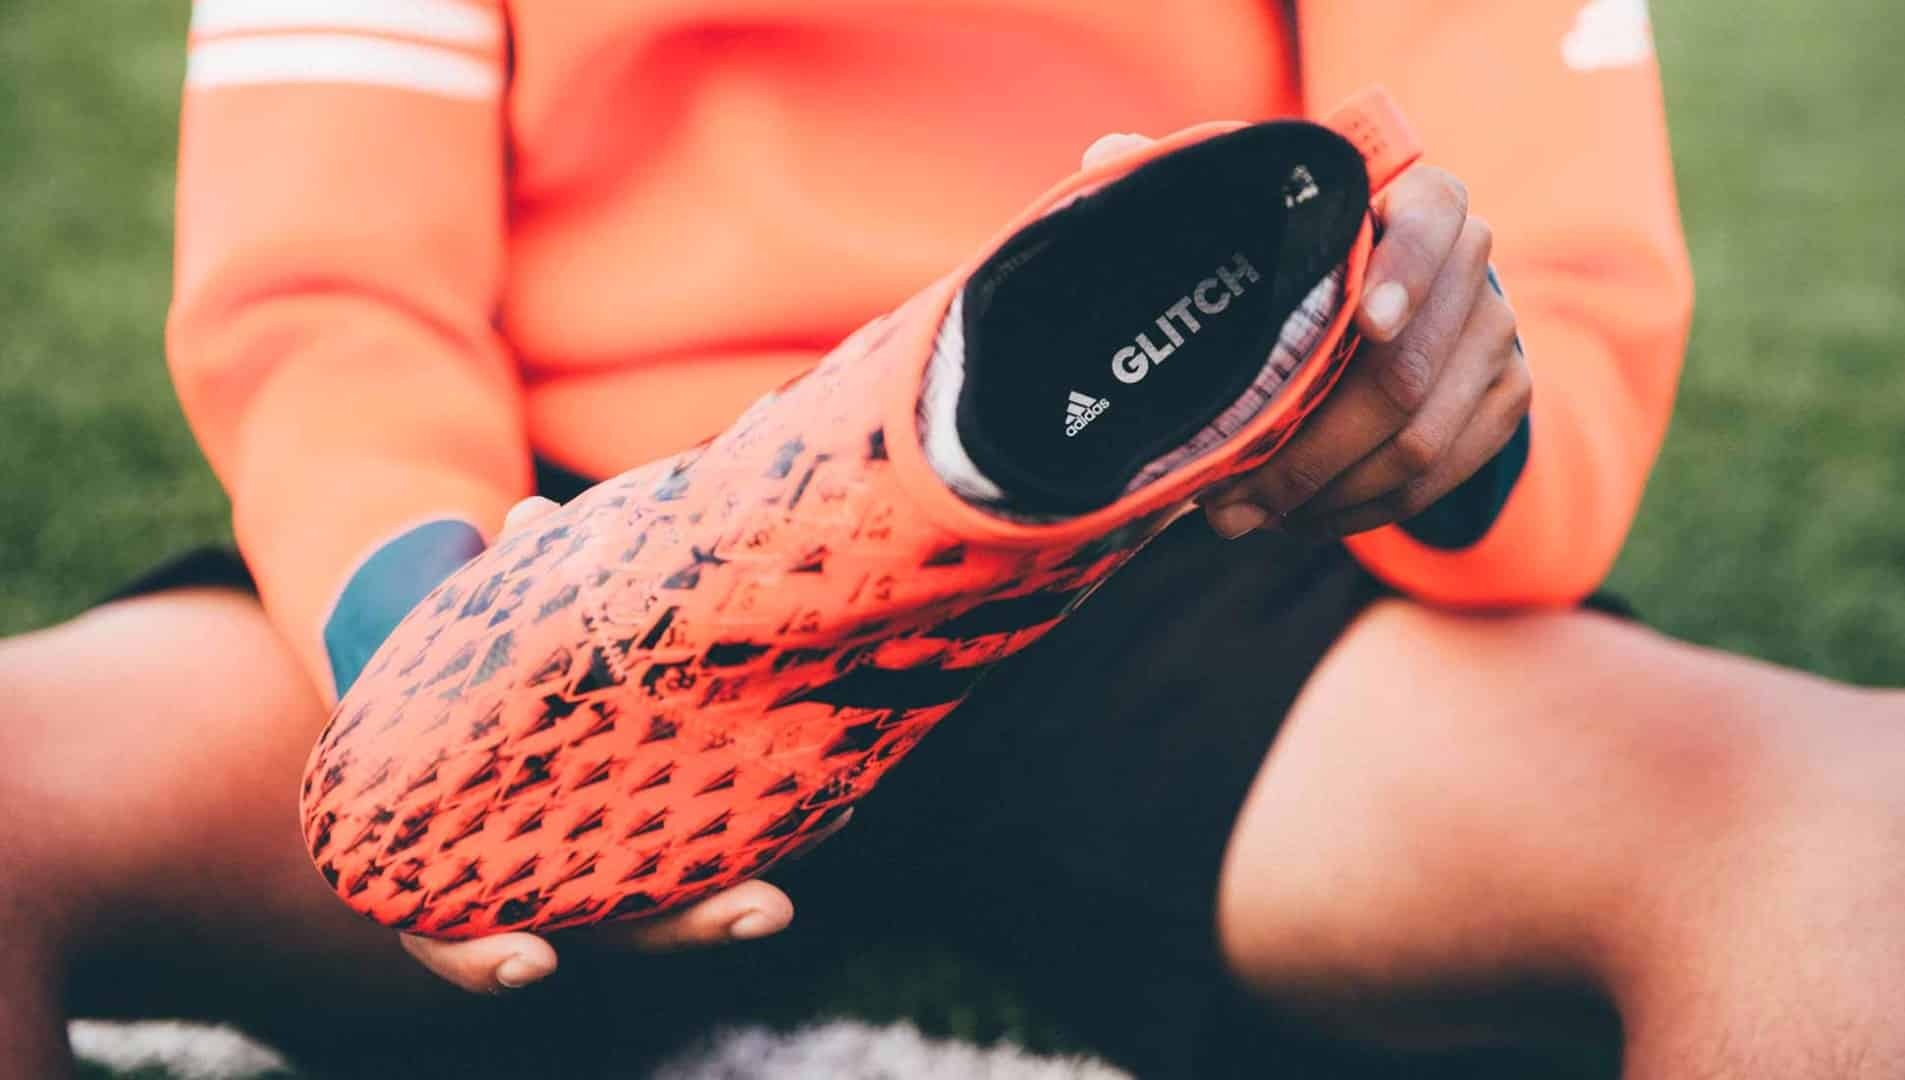 chaussures-adidas-glitch-img5